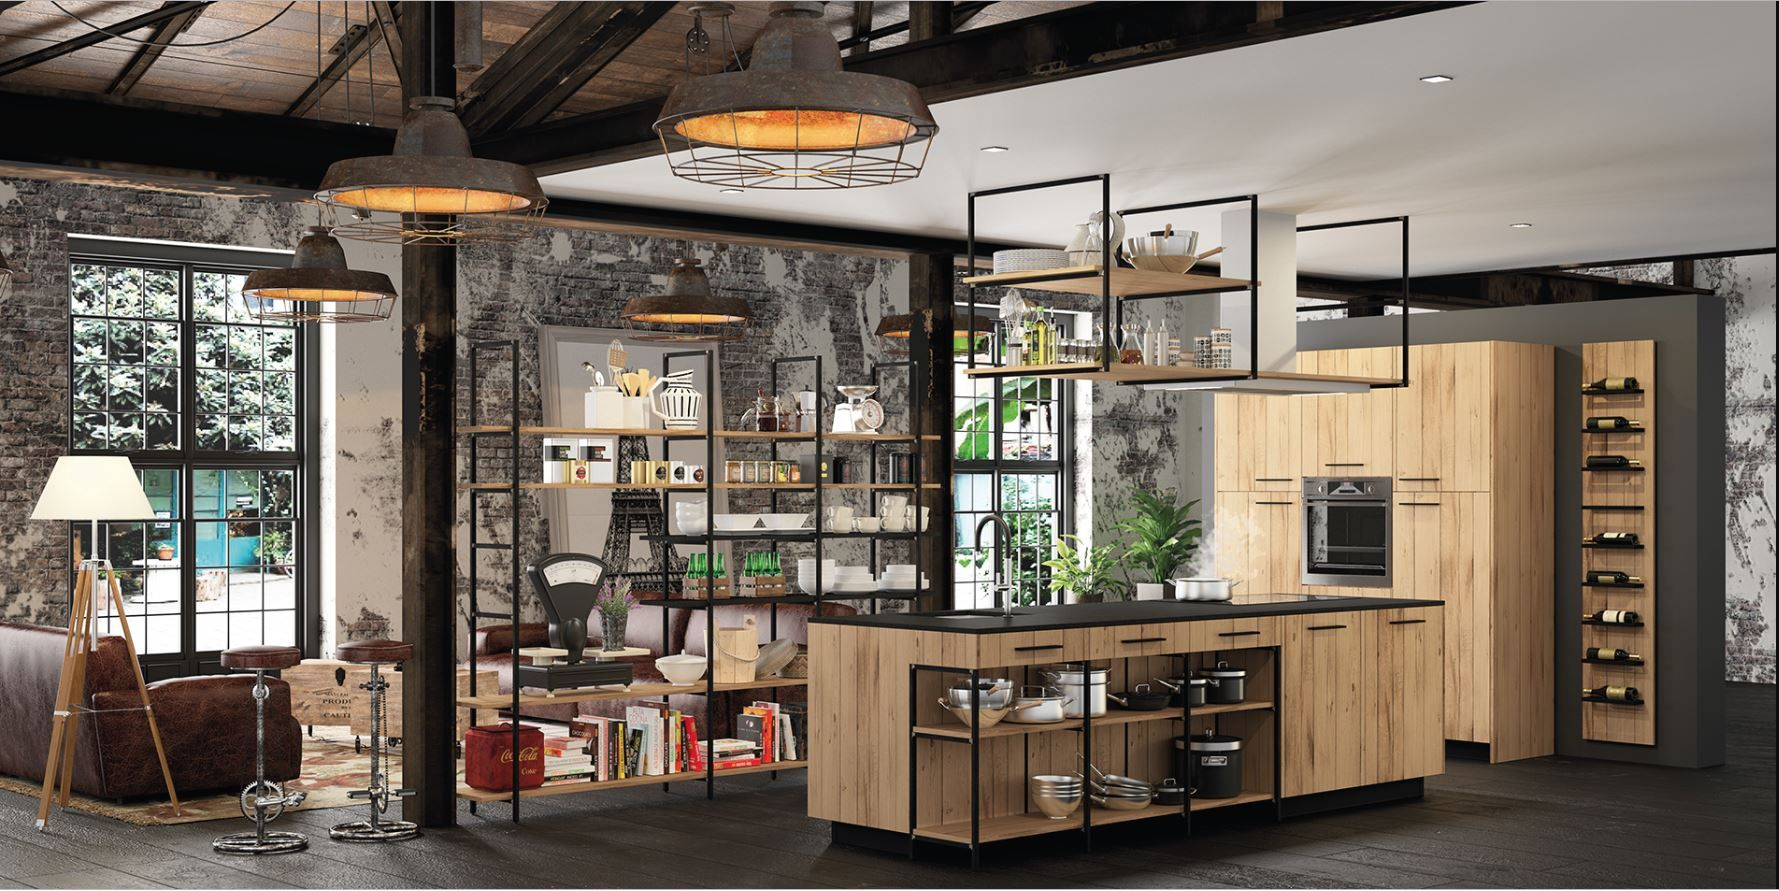 Cuisine Type Industrielle En Bois Cuisine Style Industriel Cuisines Design Style Industriel